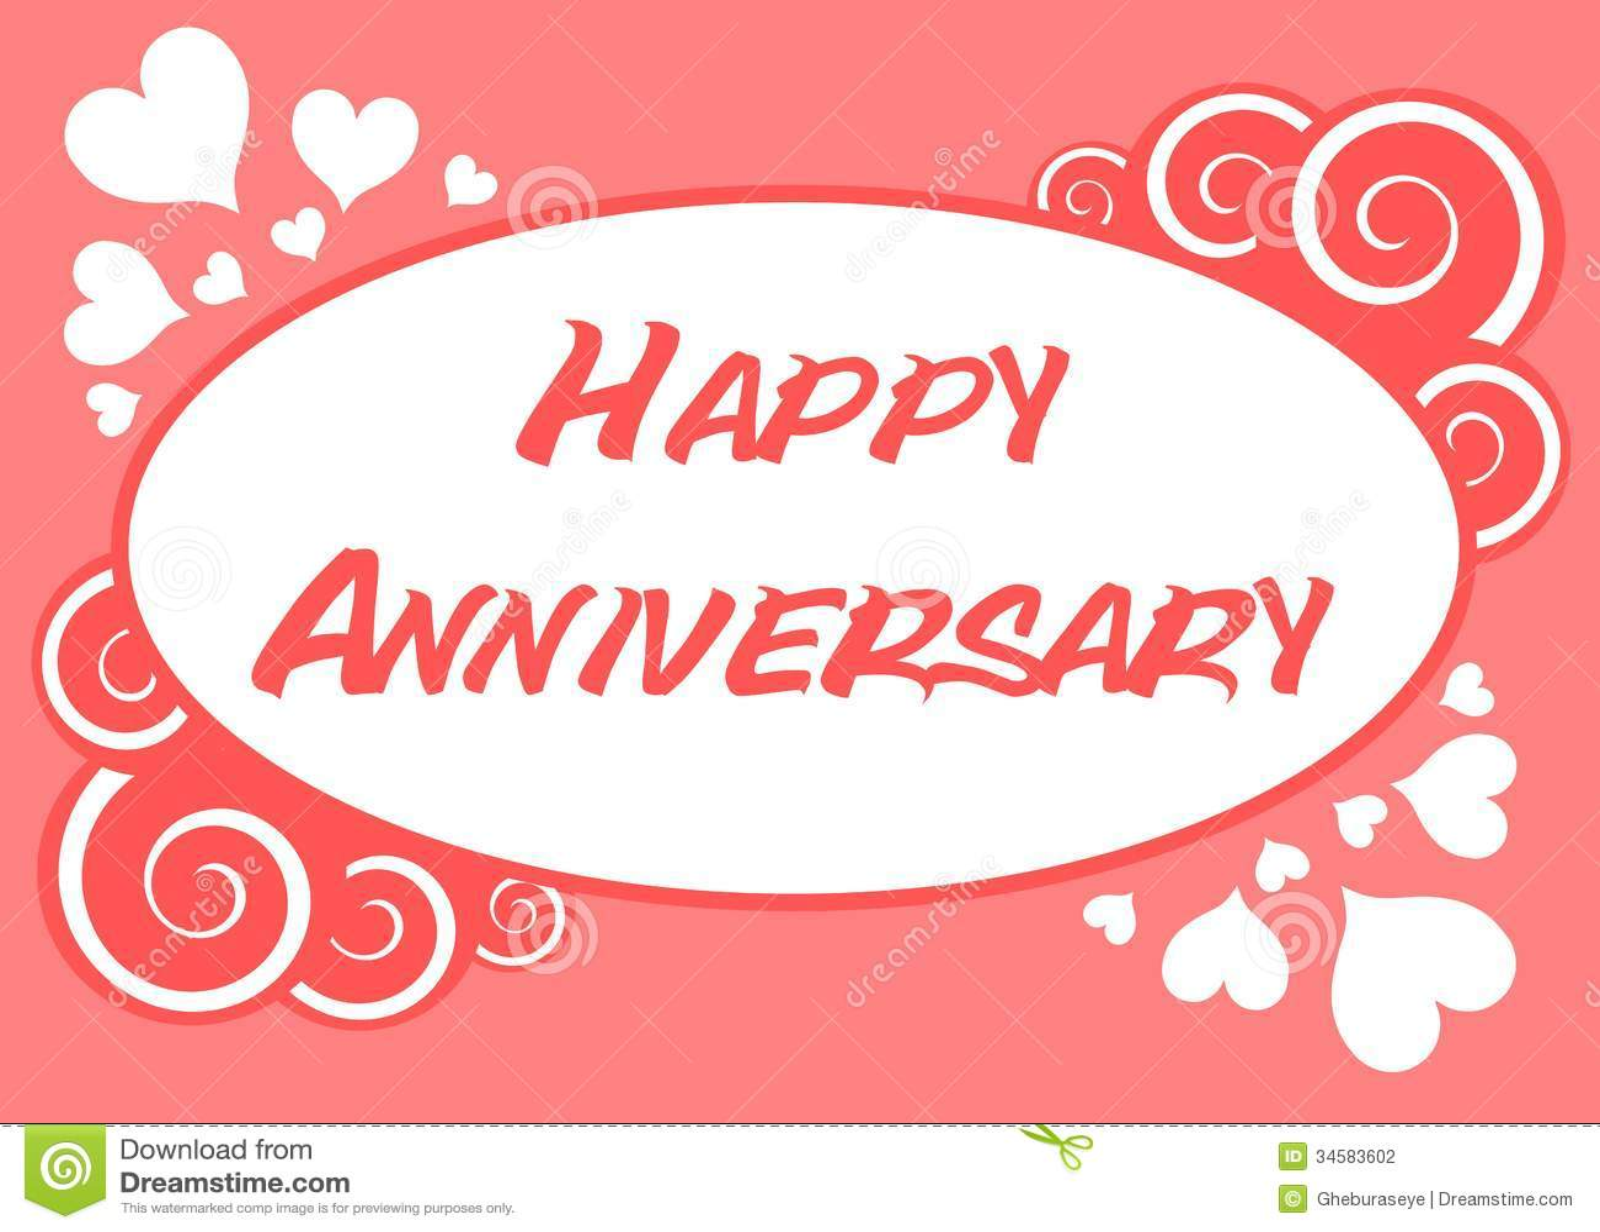 Happy Anniversary Stock Photography - Image: 34583602